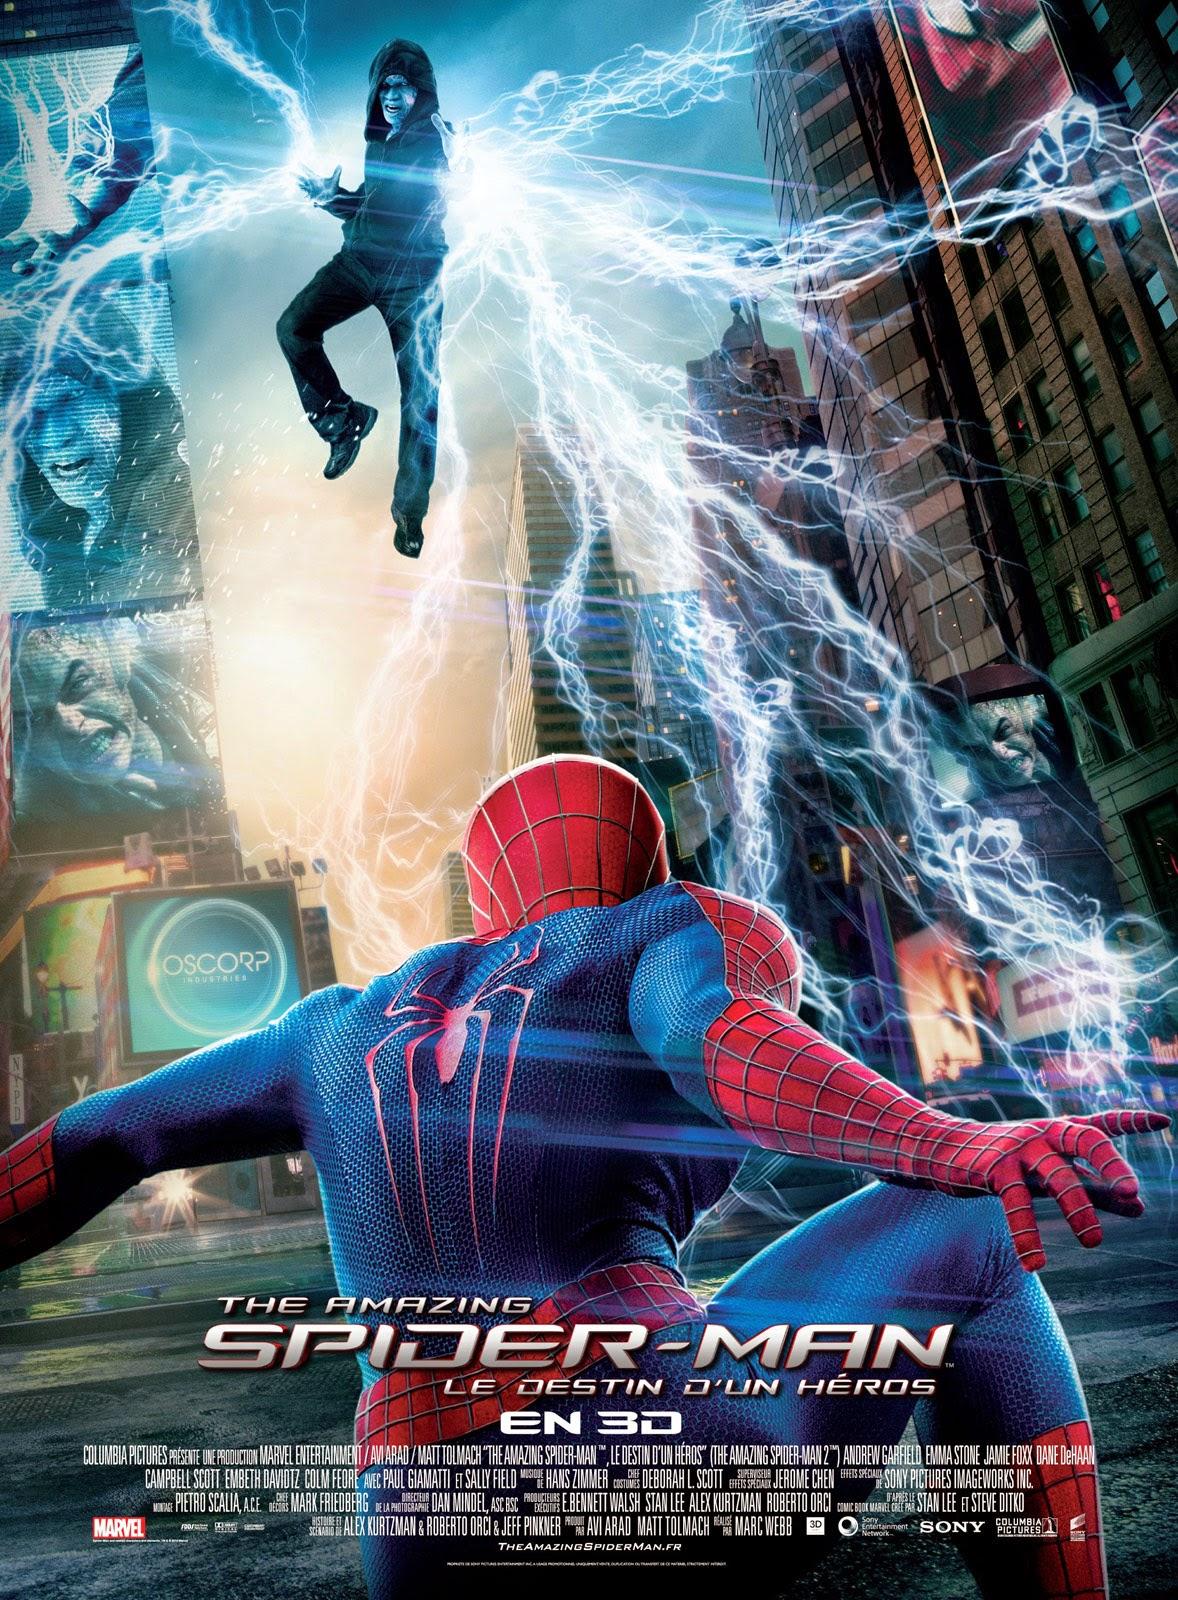 Regarder The Amazing Spider-Man 2 en streaming